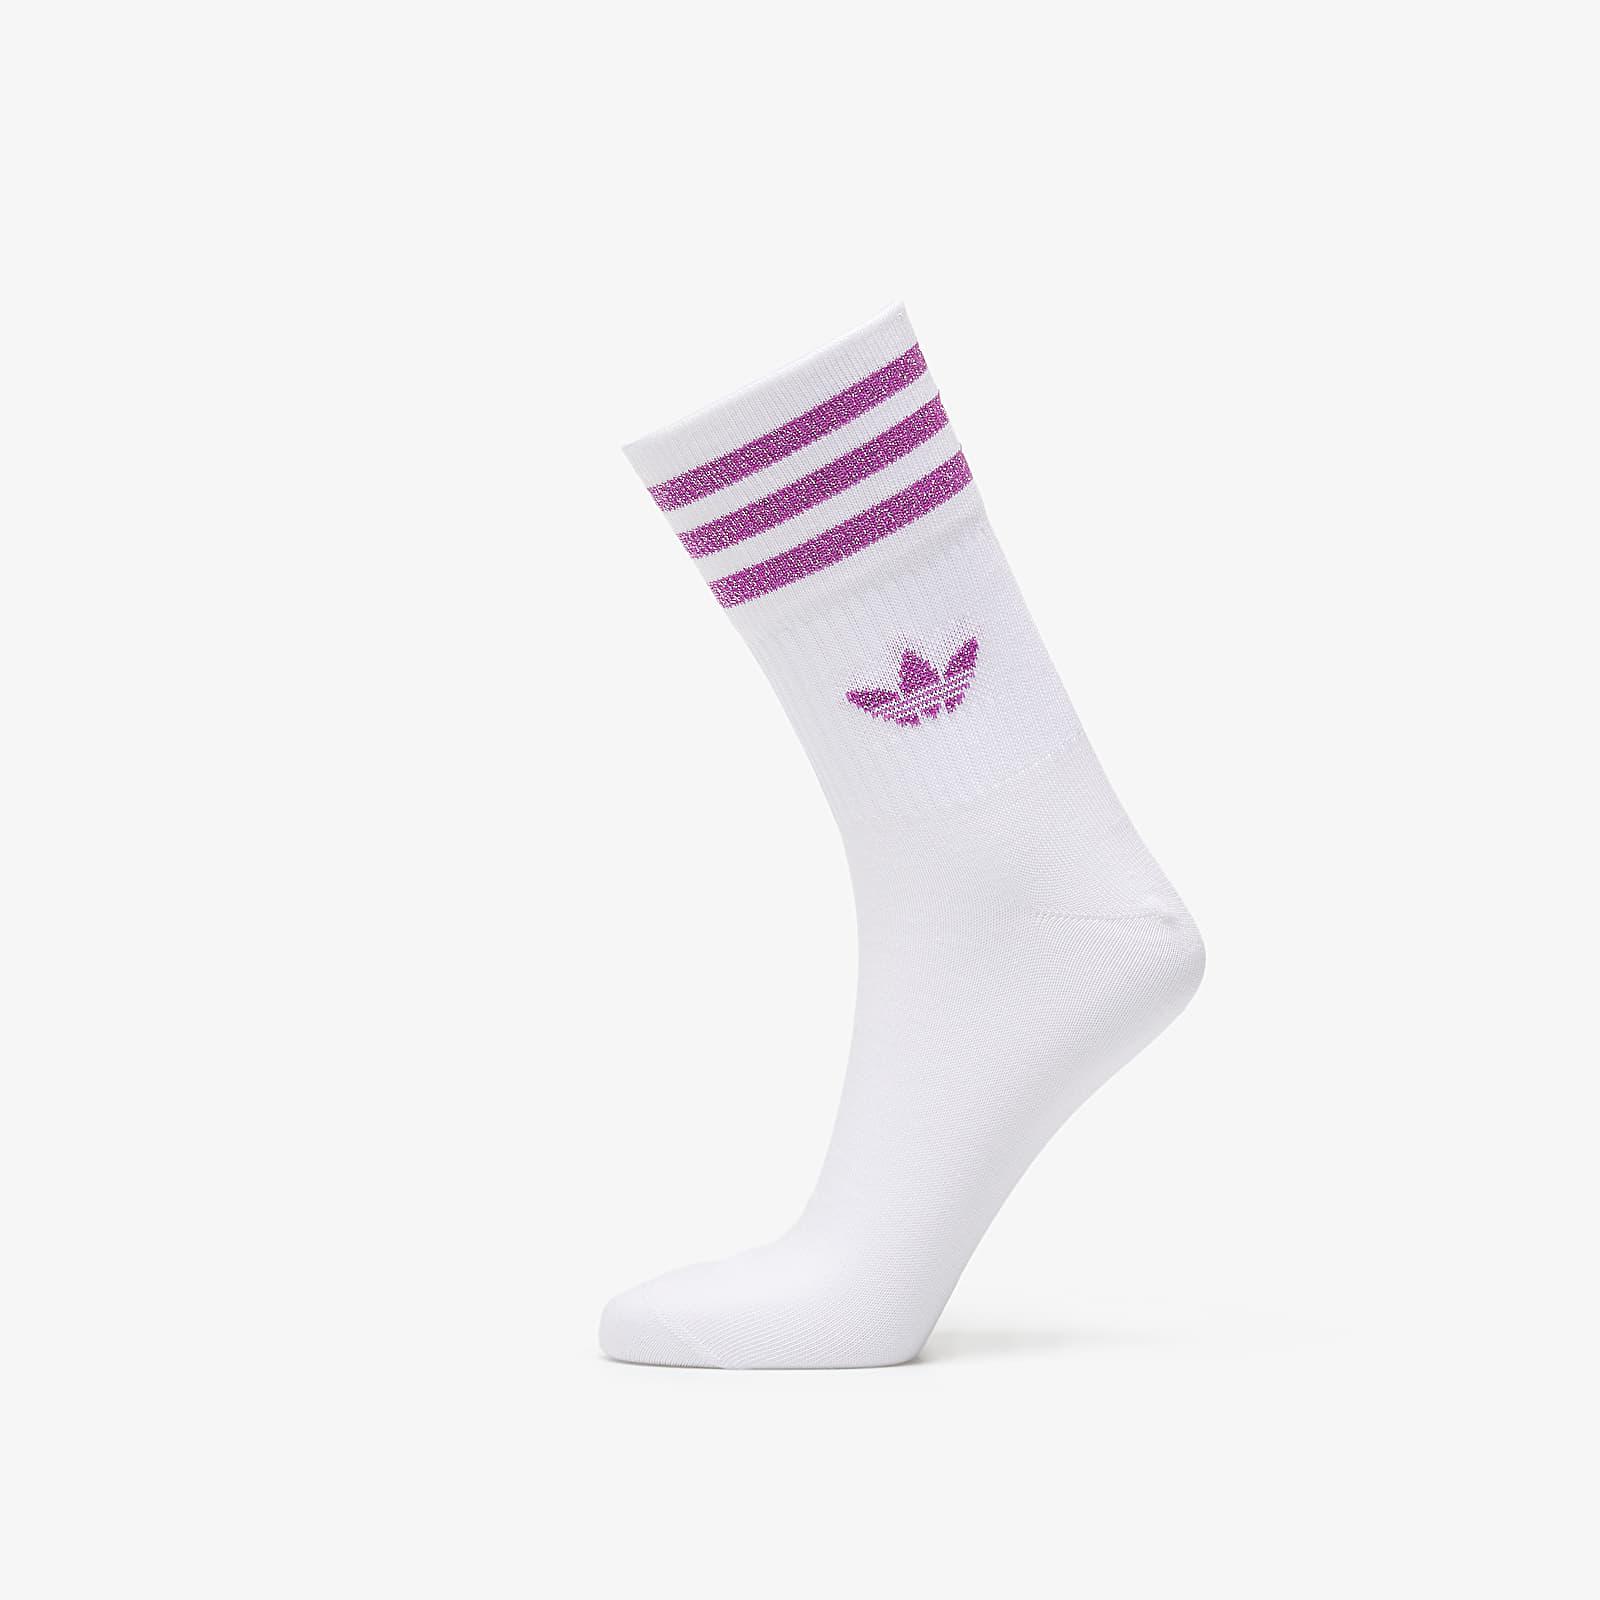 Socks adidas Mid Cut Glitter Socks White/ White